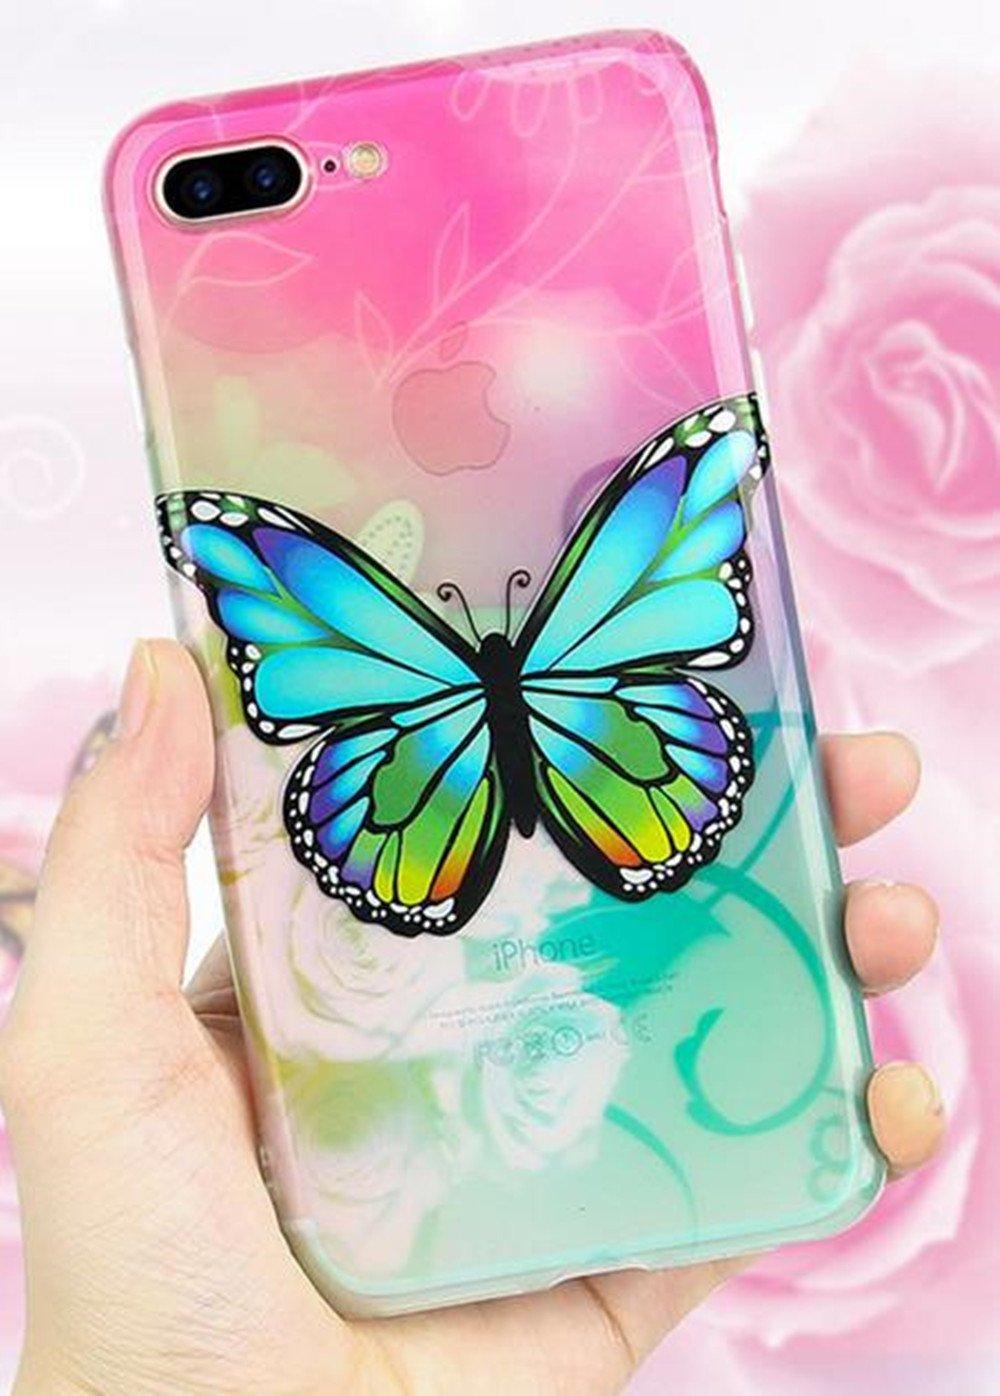 iPhone 6 Plusカラフルバタフライケース、Inspirationcソフトスリムシリコン傷防止耐衝撃Tpu Armorラバーケースカバーfor iPhone 6 Plus / 6s Plus 5.5インチ iPhone 7[4.7 Inch] B06WWBVK6D iPhone 7[4.7 Inch]|ローズレッド ローズレッド iPhone 7[4.7 Inch]